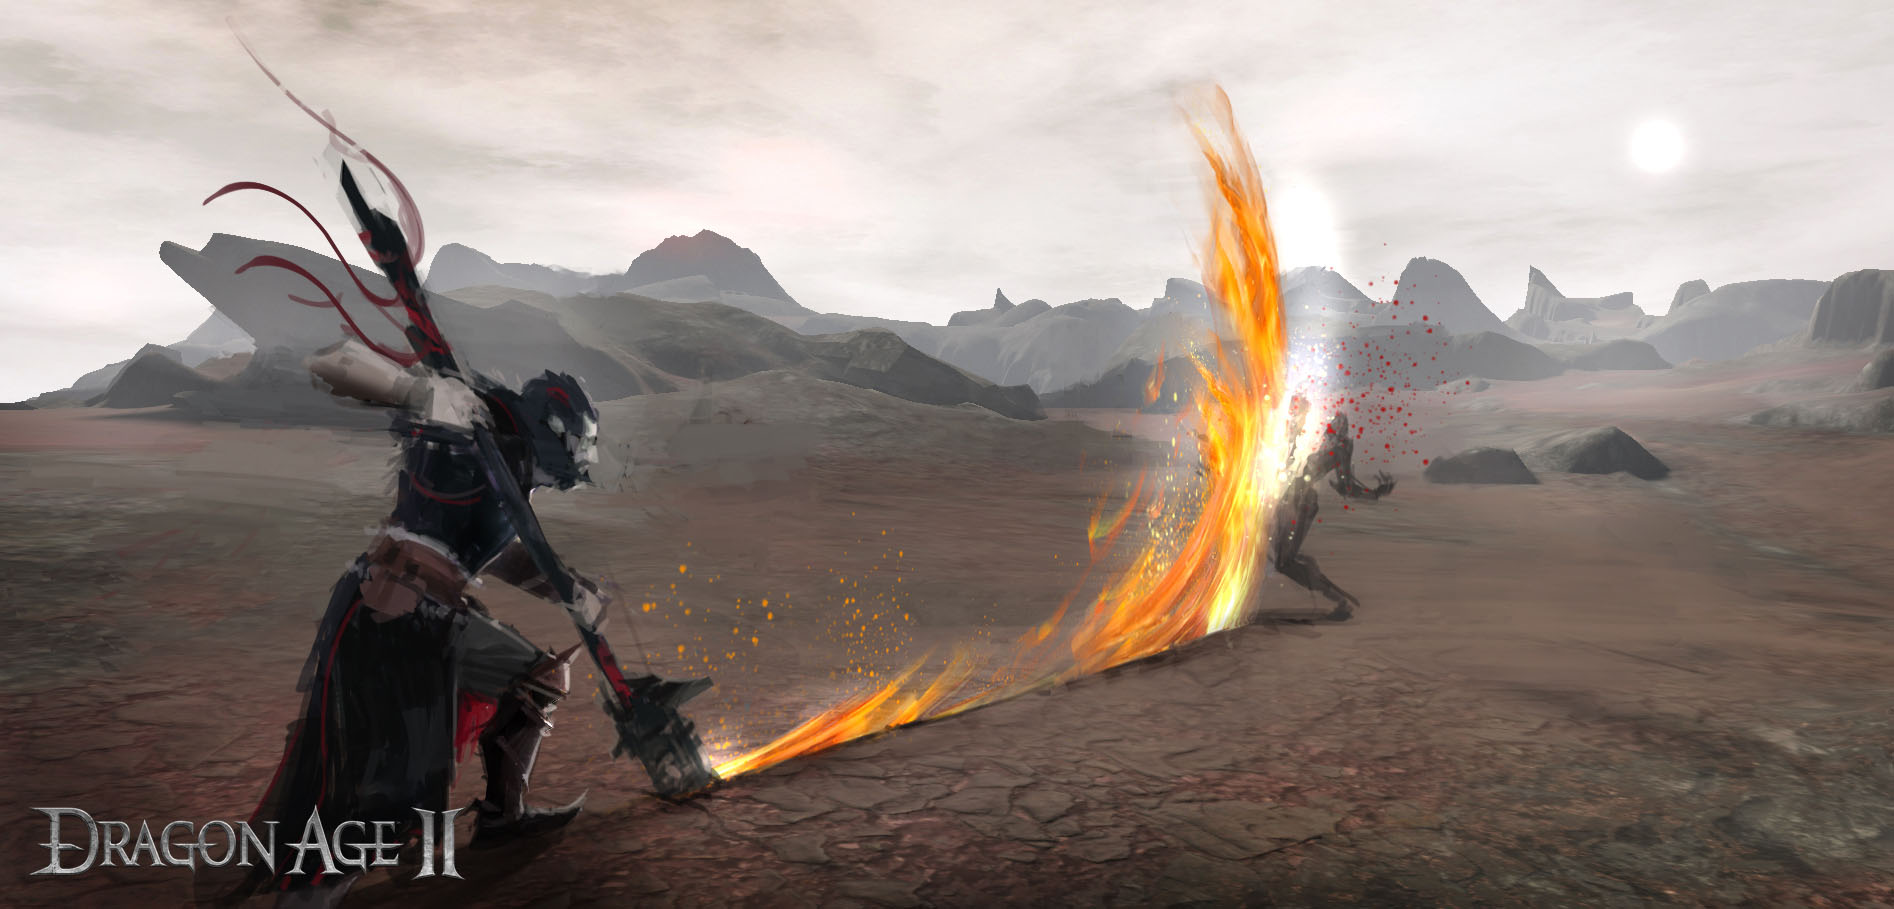 Dragon Age II – Ferelden opět potřebuje hrdinu 10285